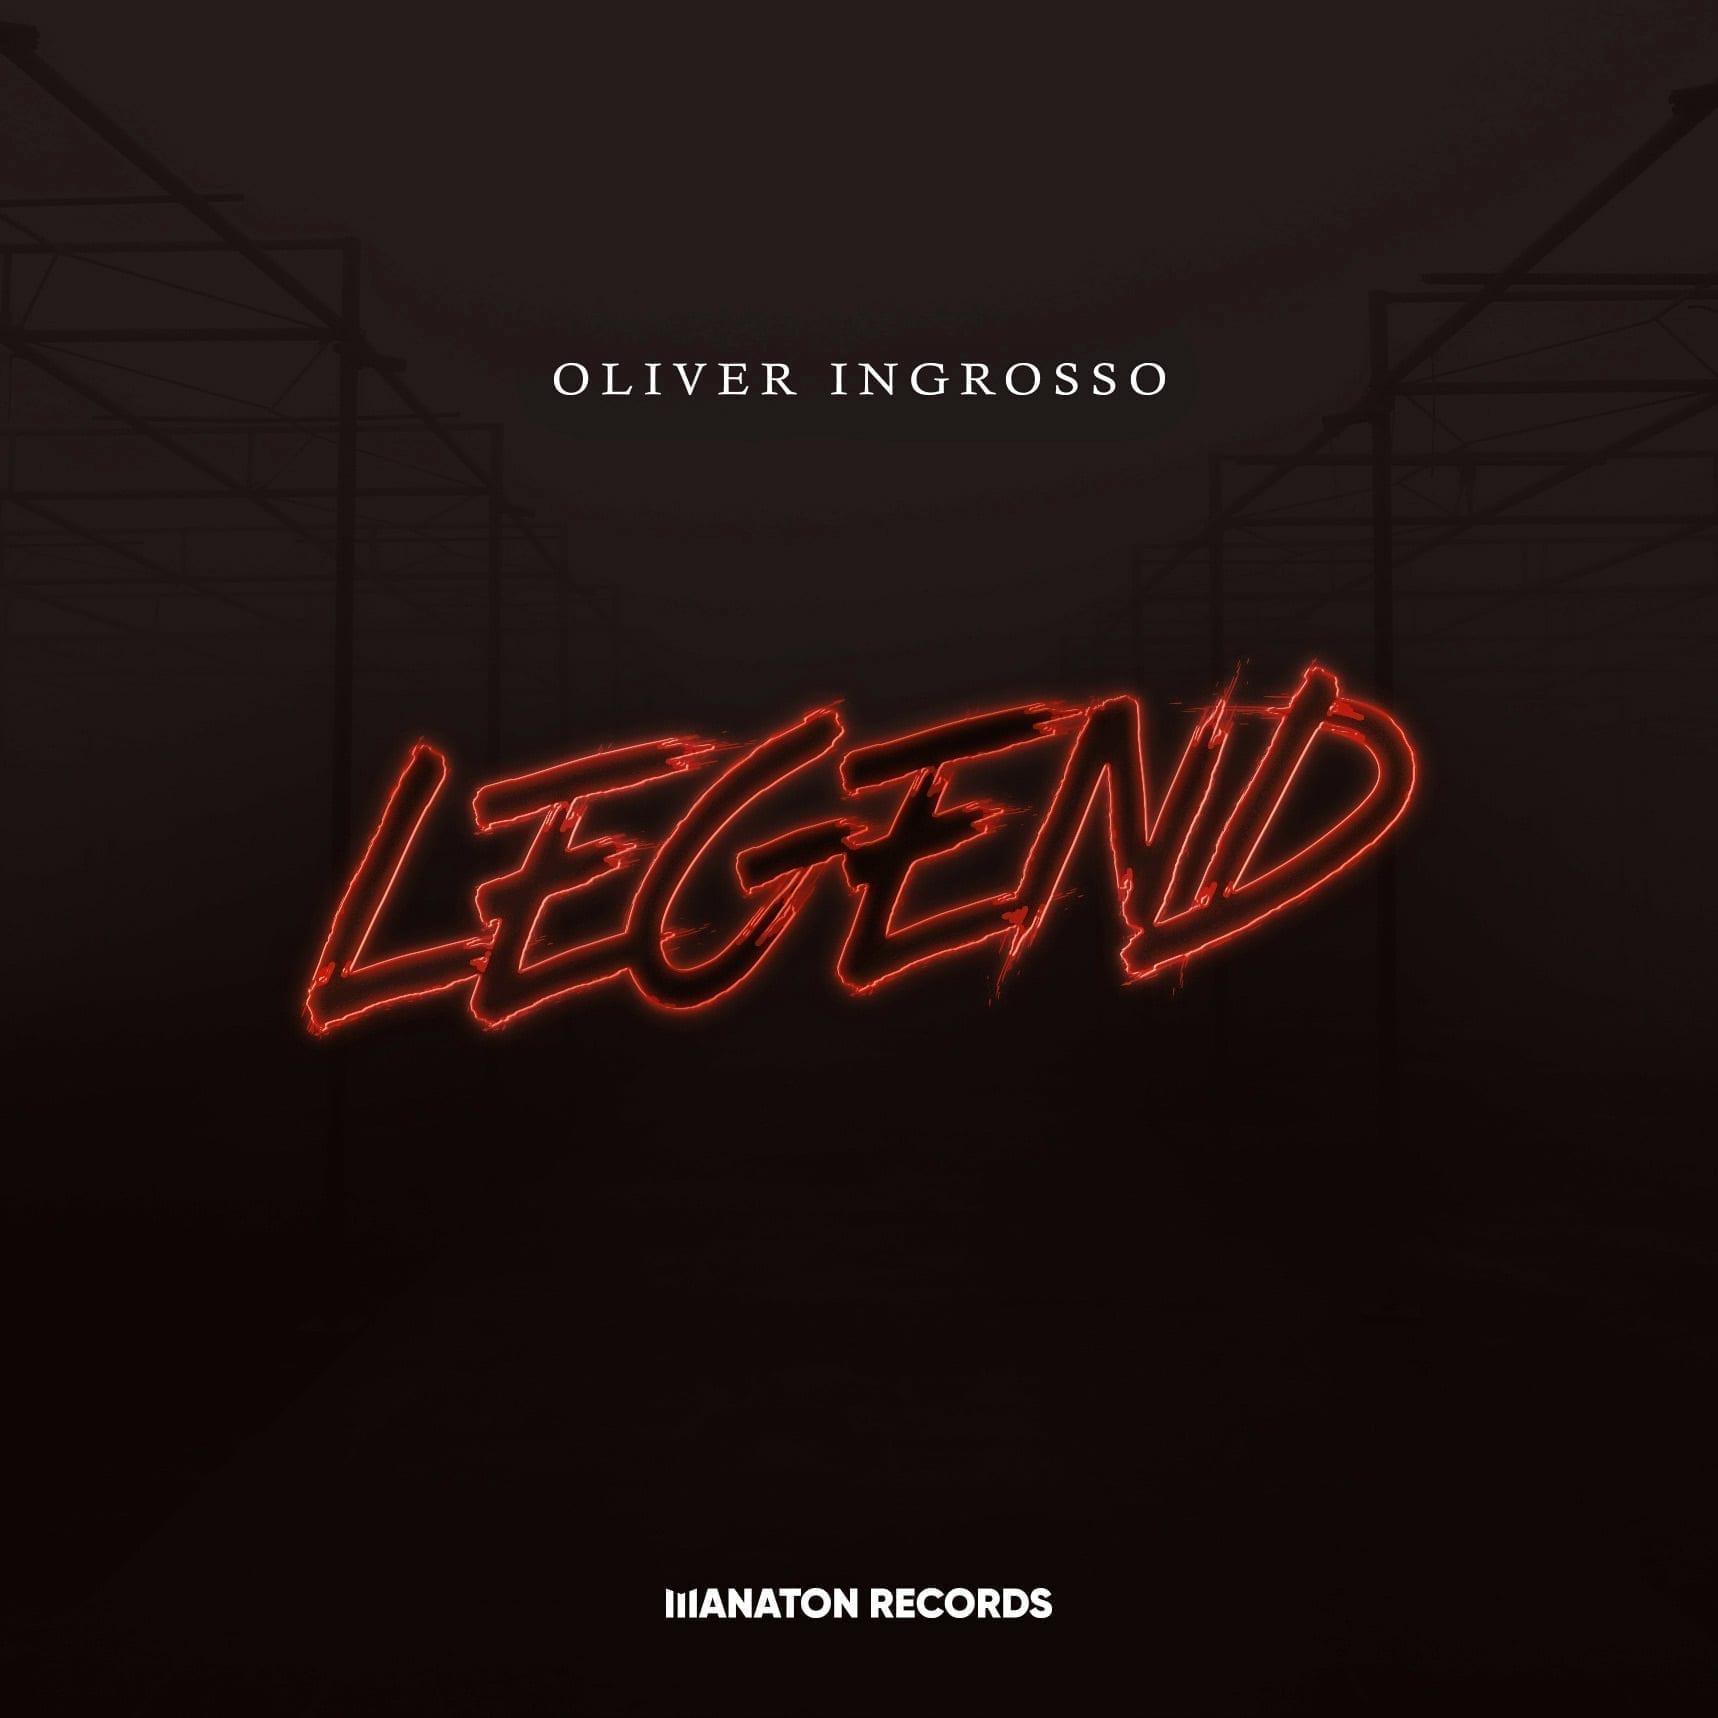 Oliver Ingrosso - Legend [Manaton Records]